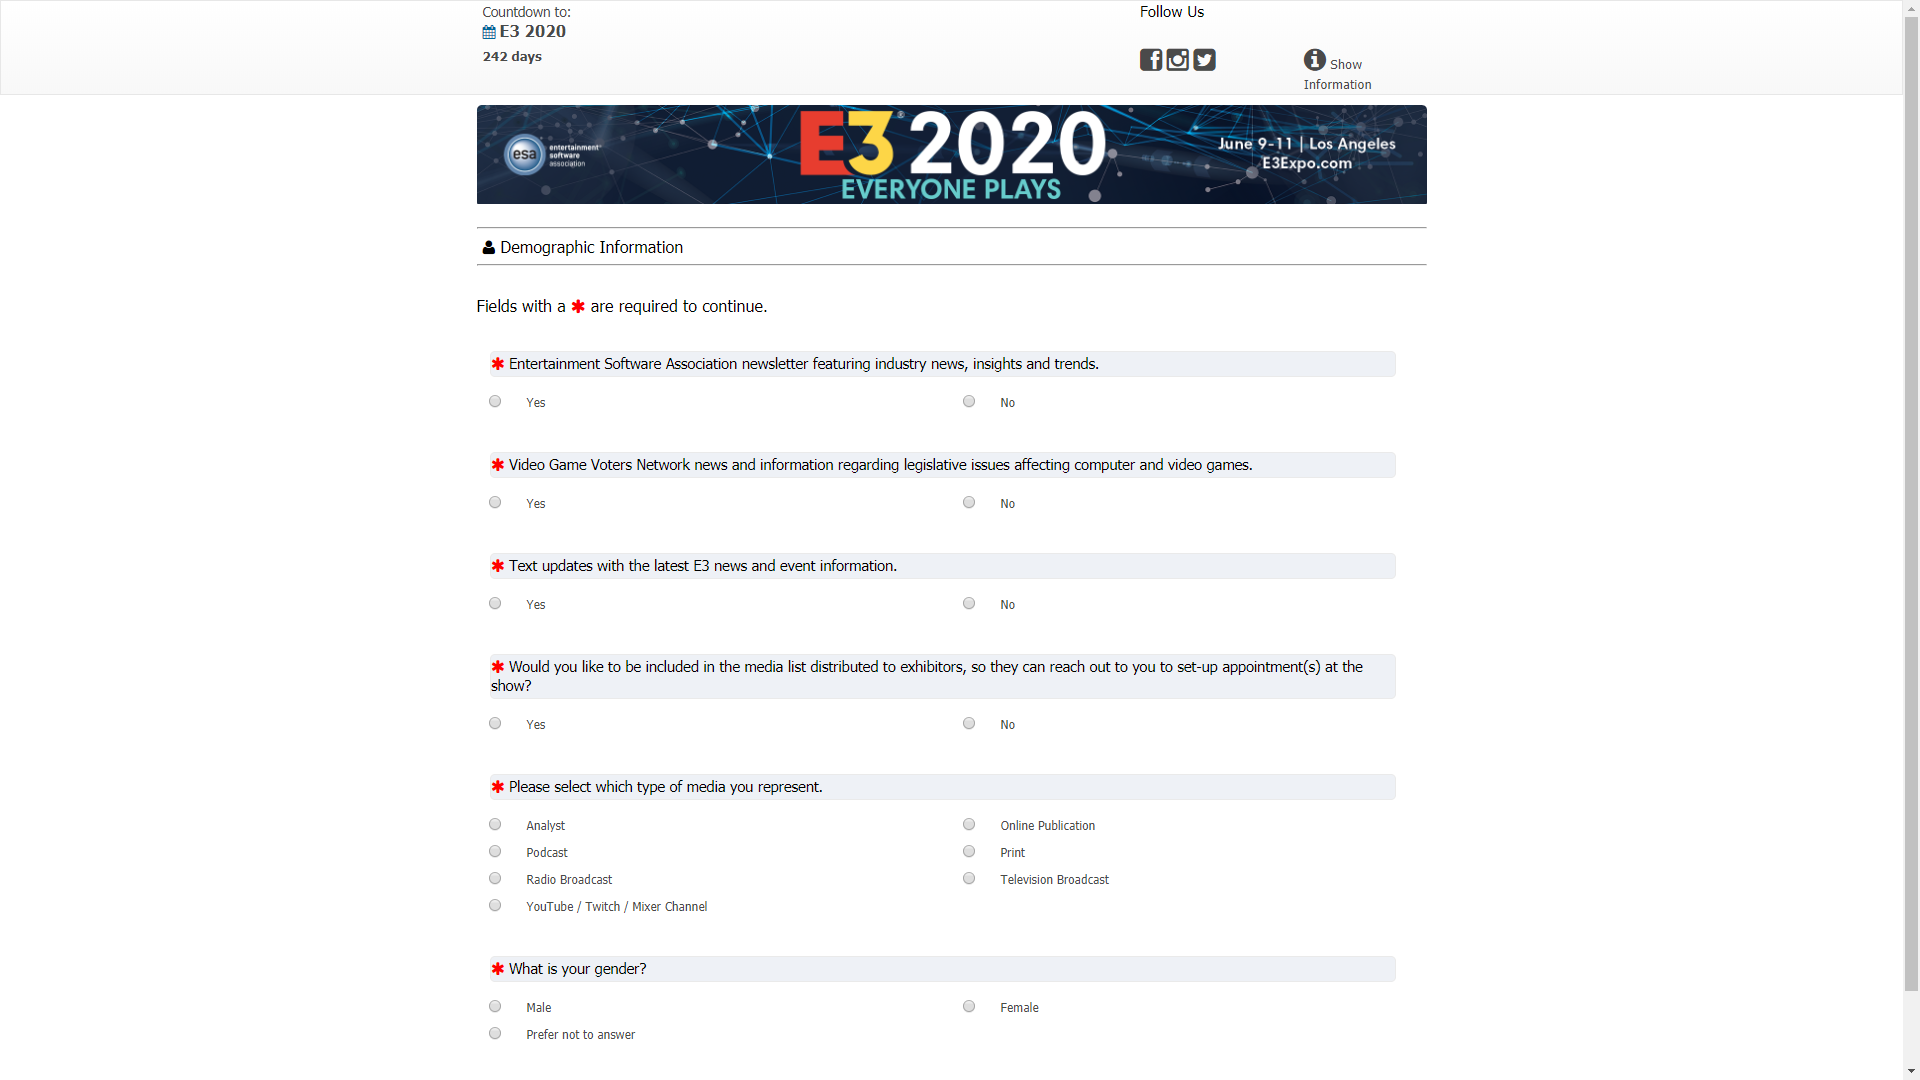 E3 2020 Games List.E3 2020 Information Passes 60 995 Media List Opt